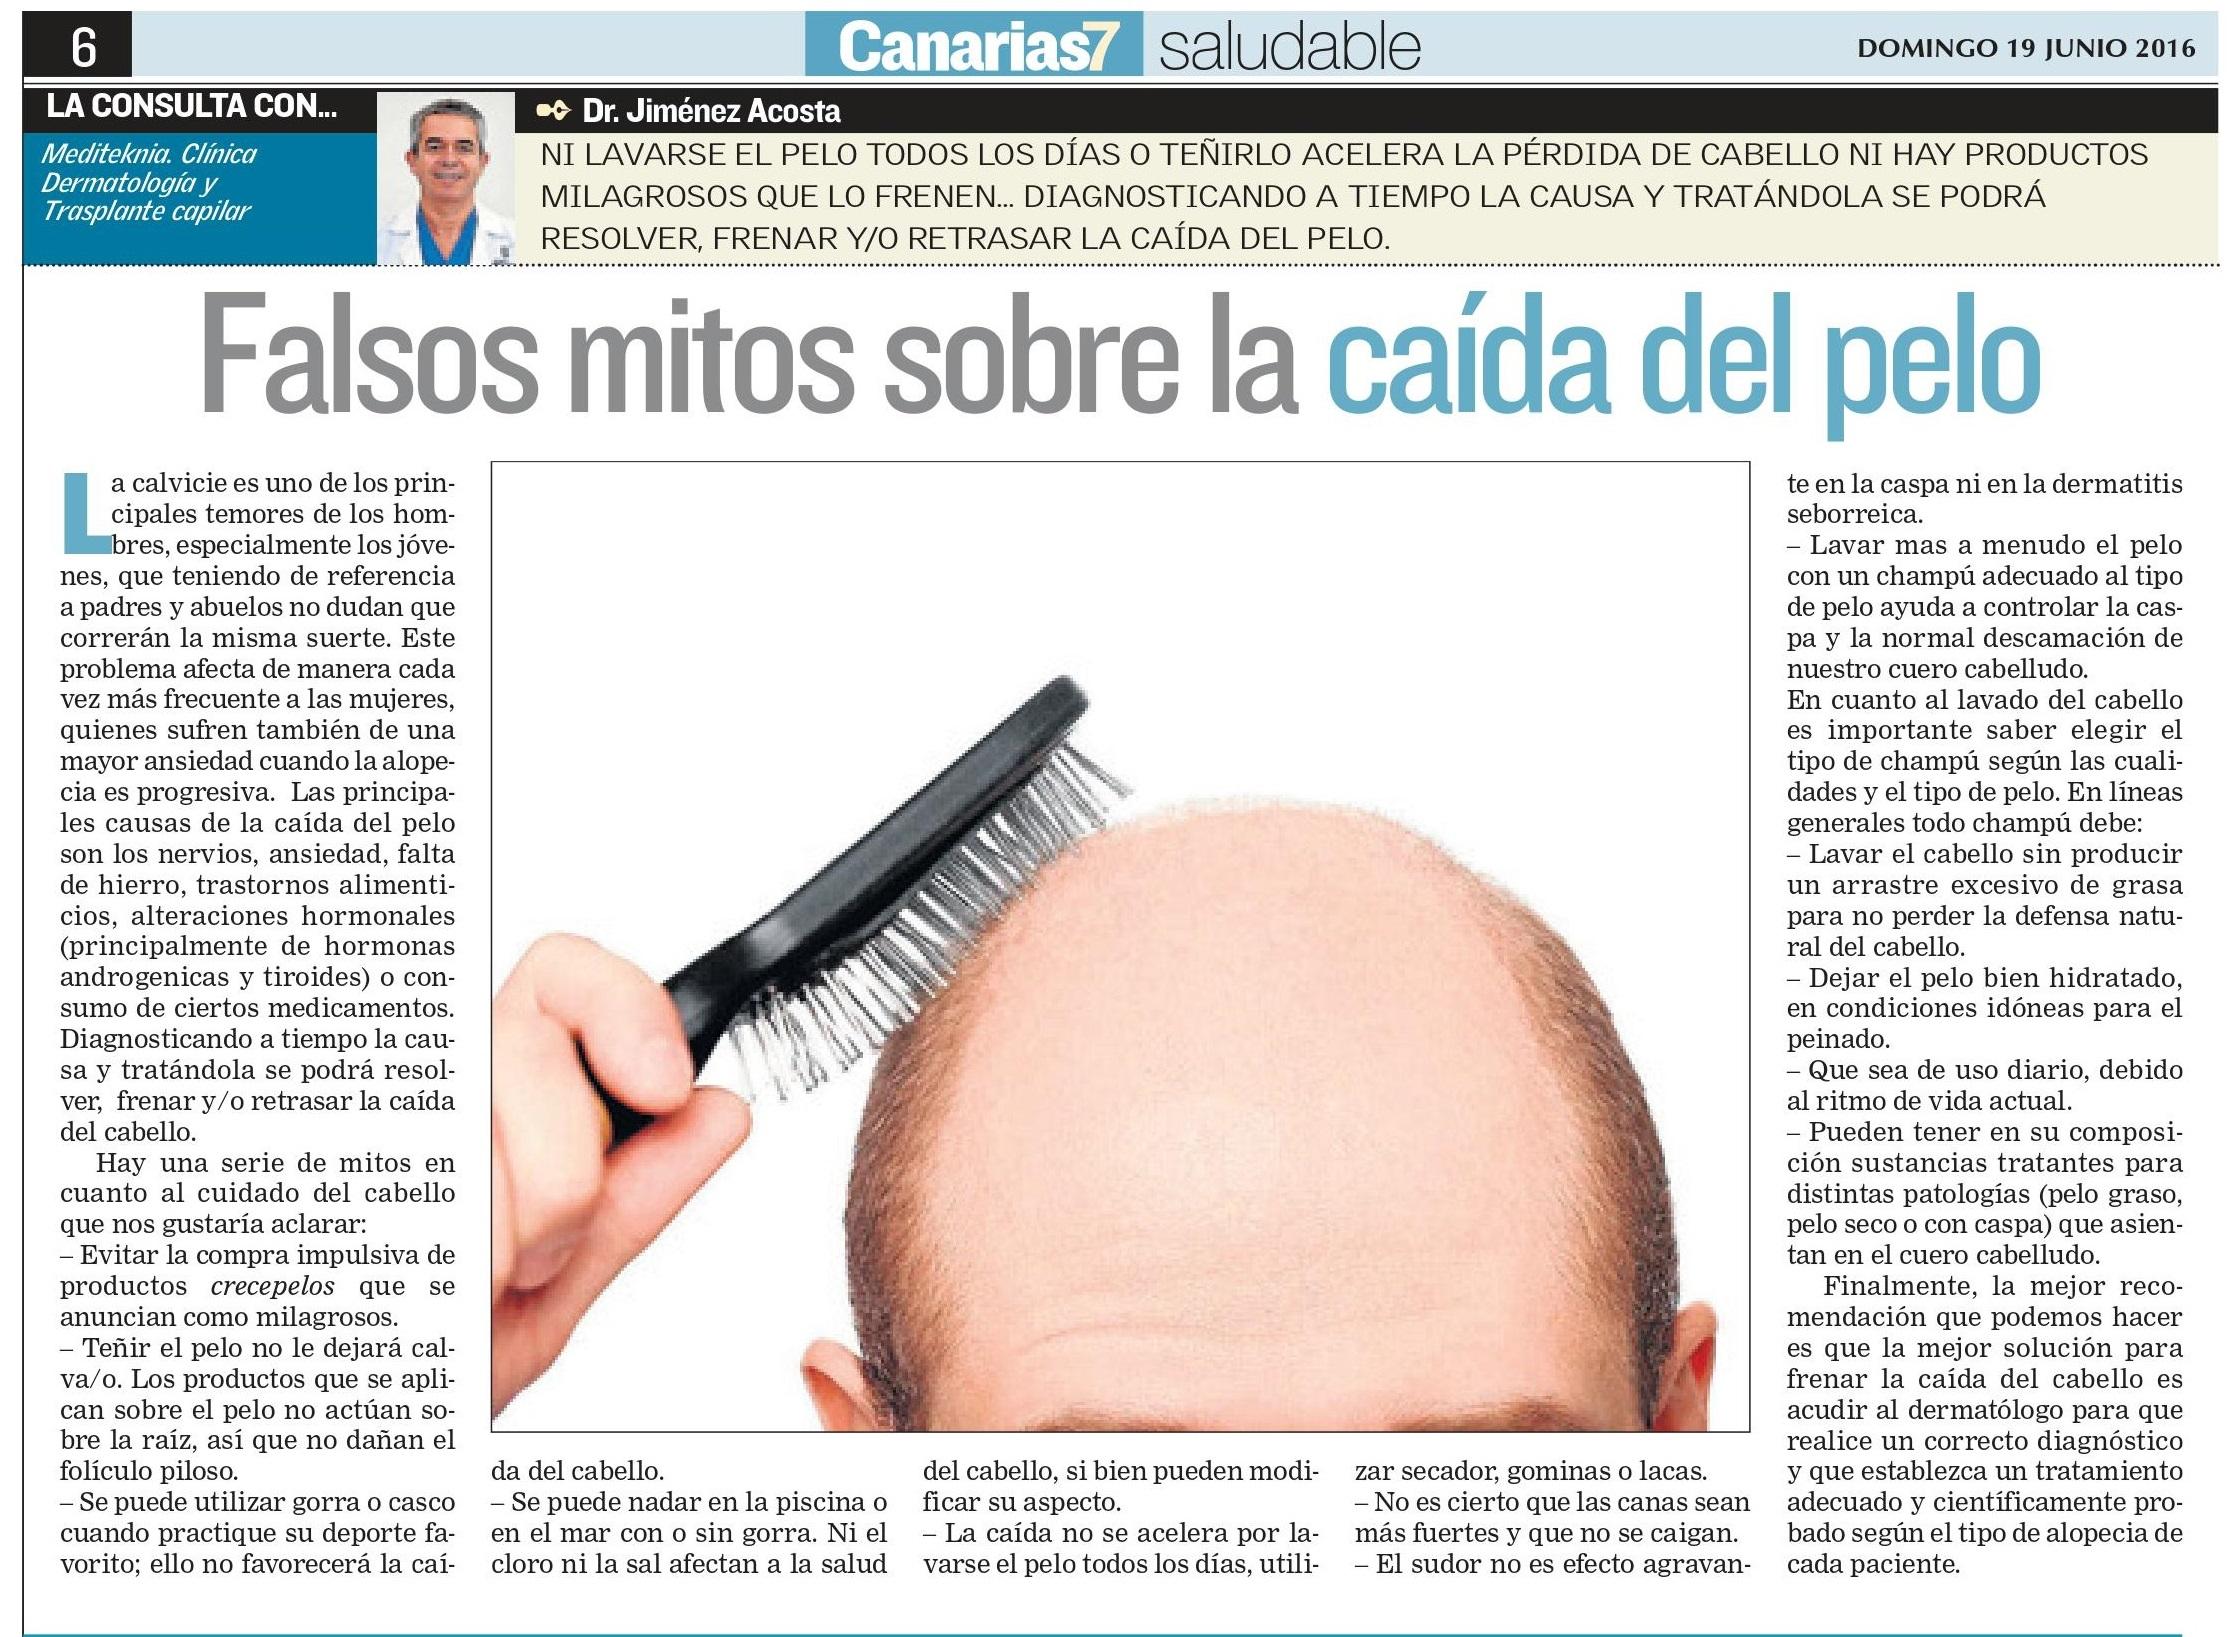 Falsos mitos sobre la caída del pelo